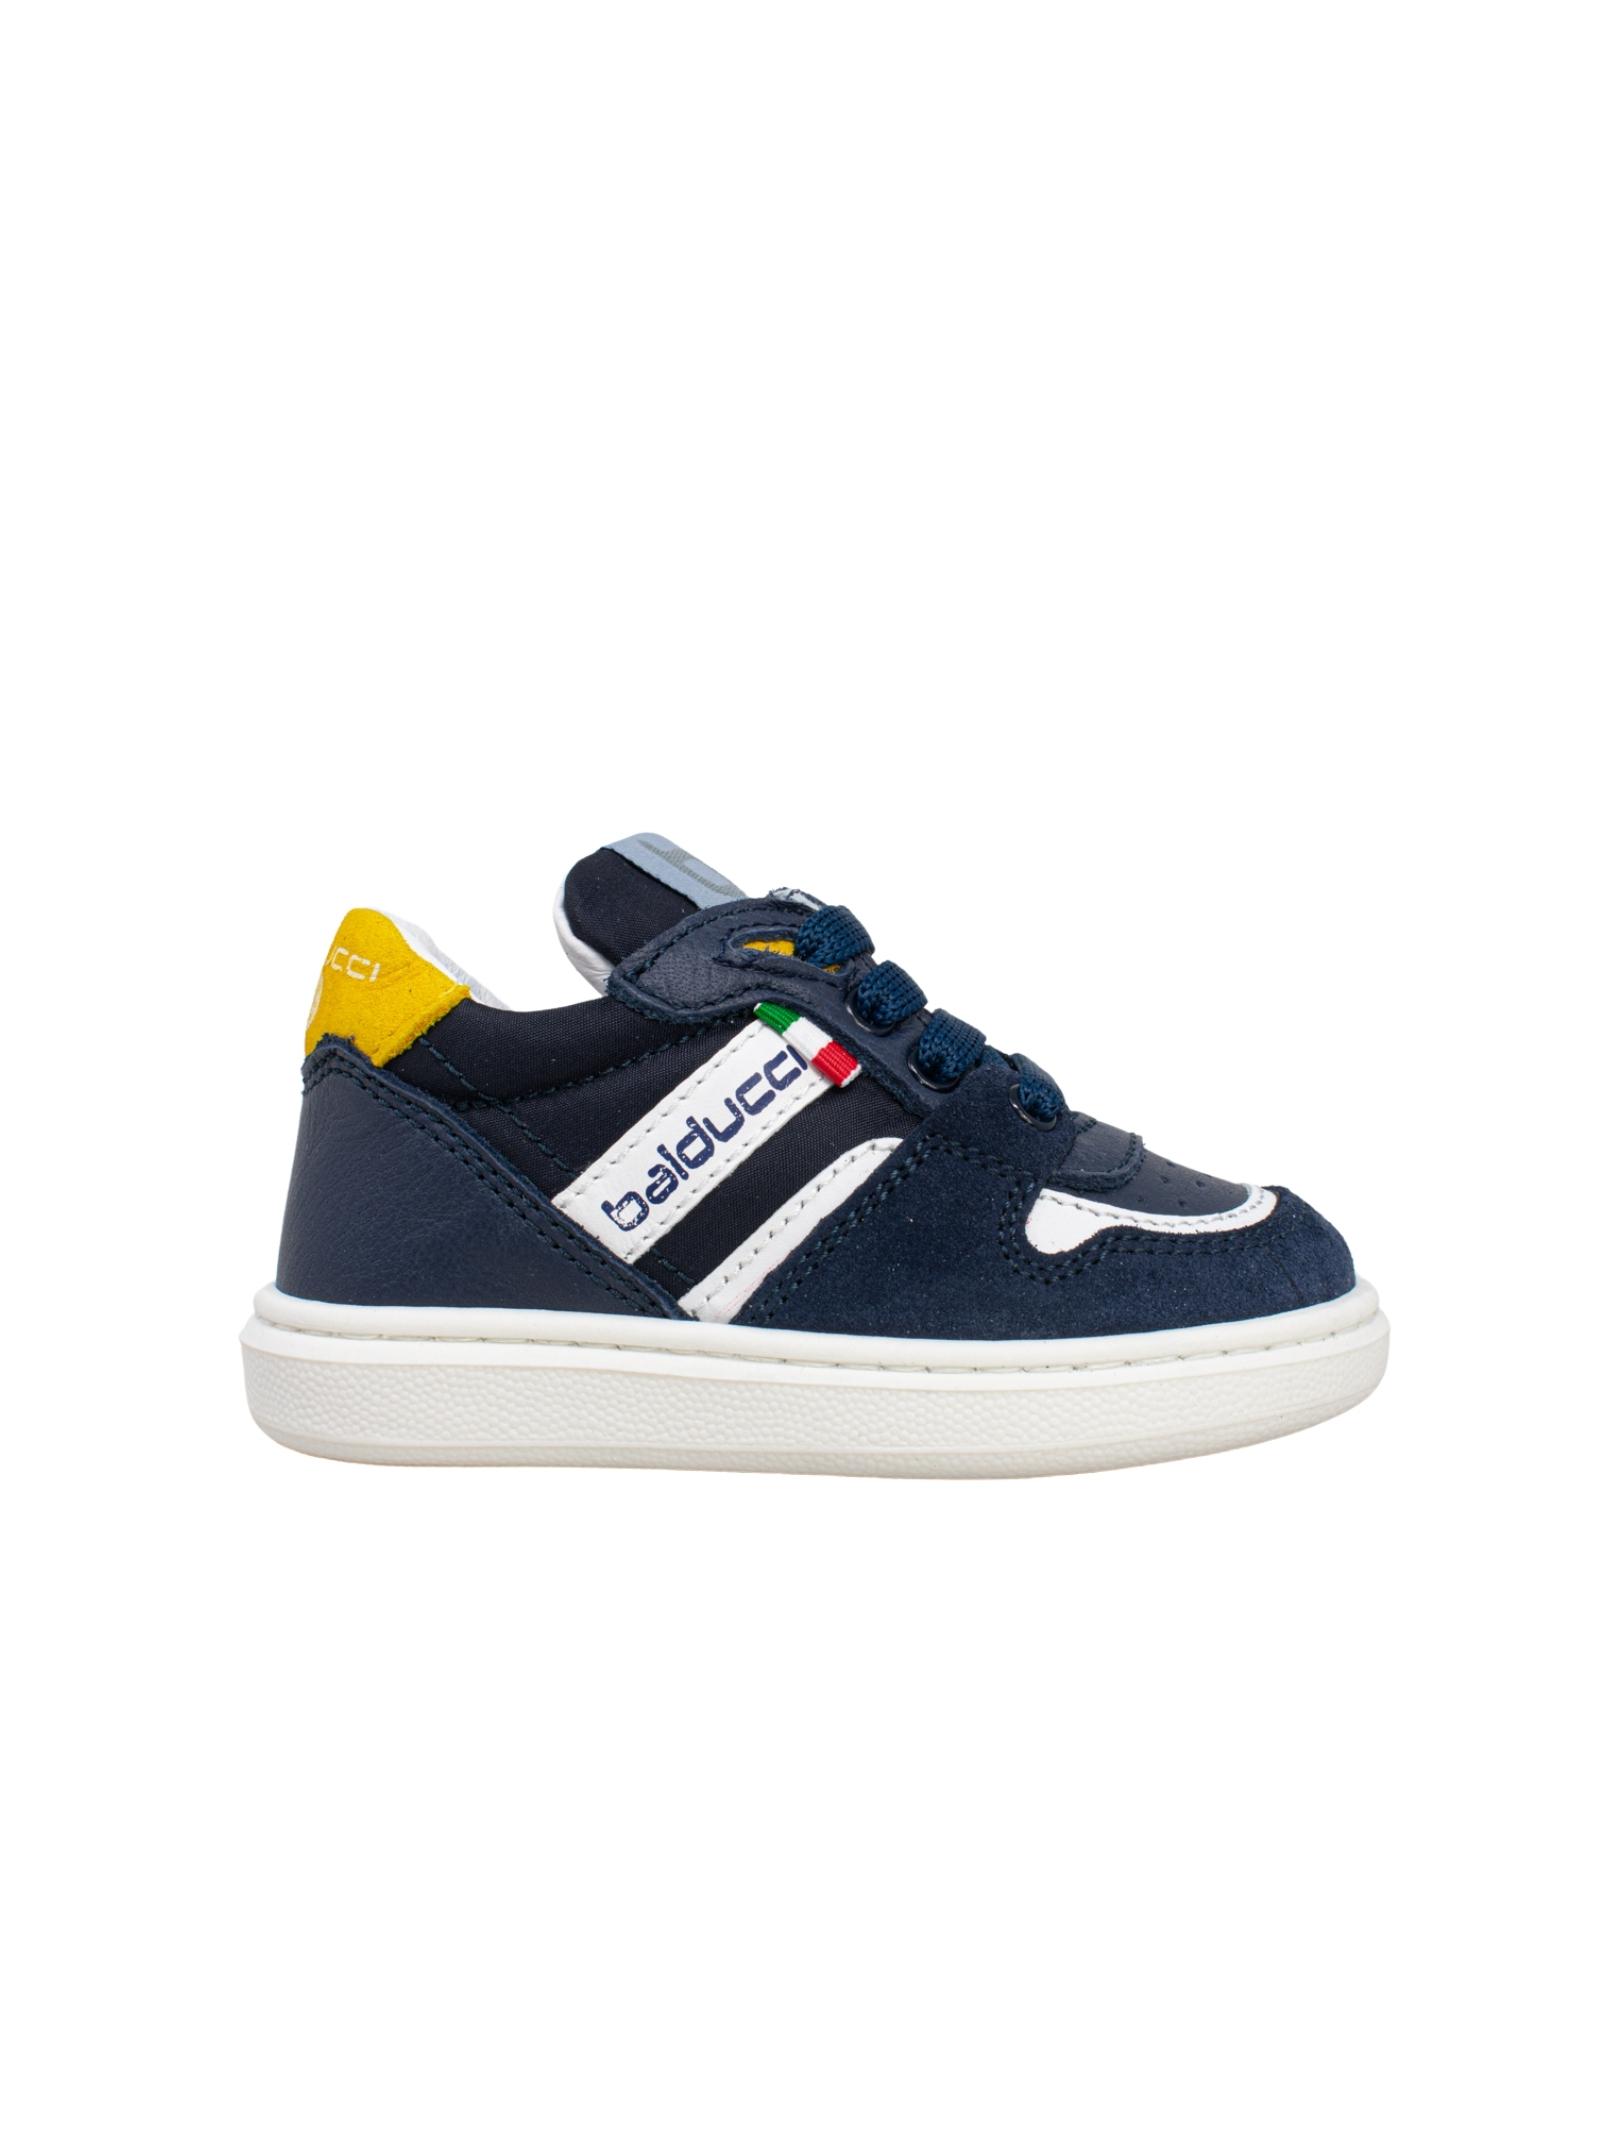 Sneakers SP English BALDUCCI | Sneakers | MSPO3602B13356